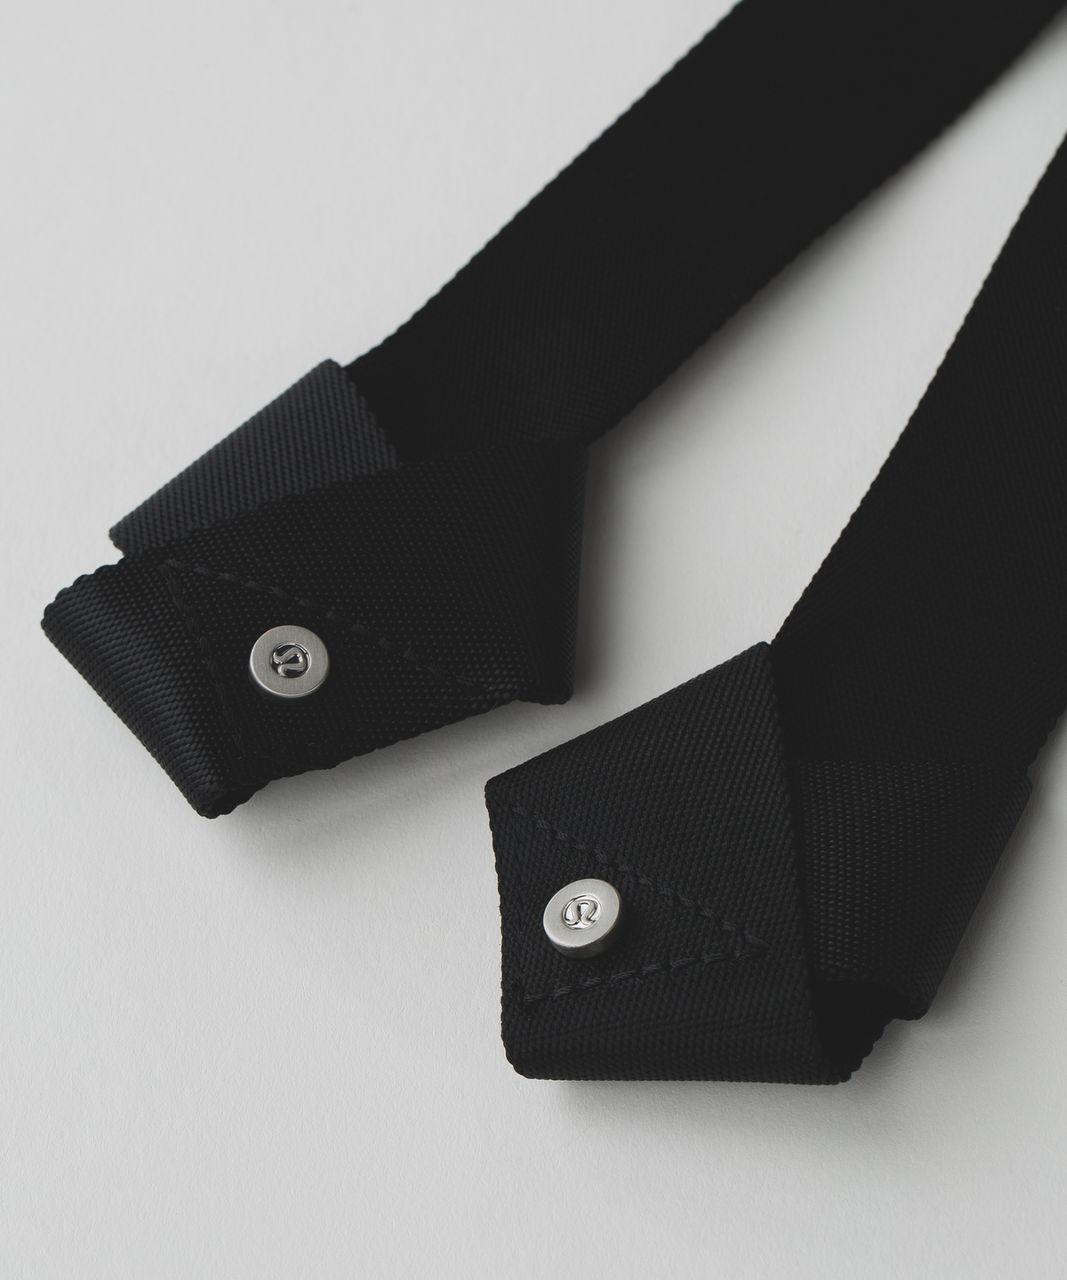 Lululemon Loop It Up Mat Strap - Black